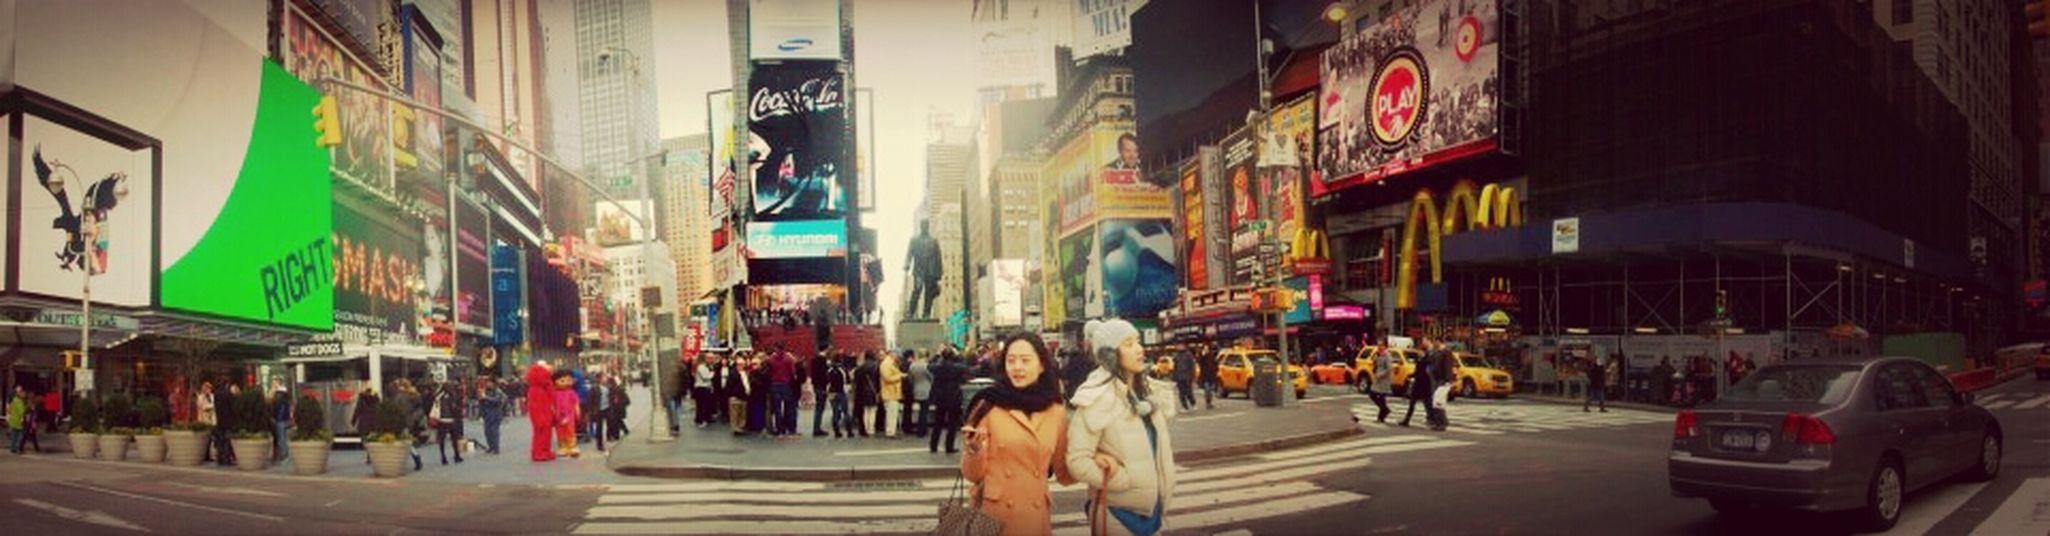 Streetphotography Urban New York